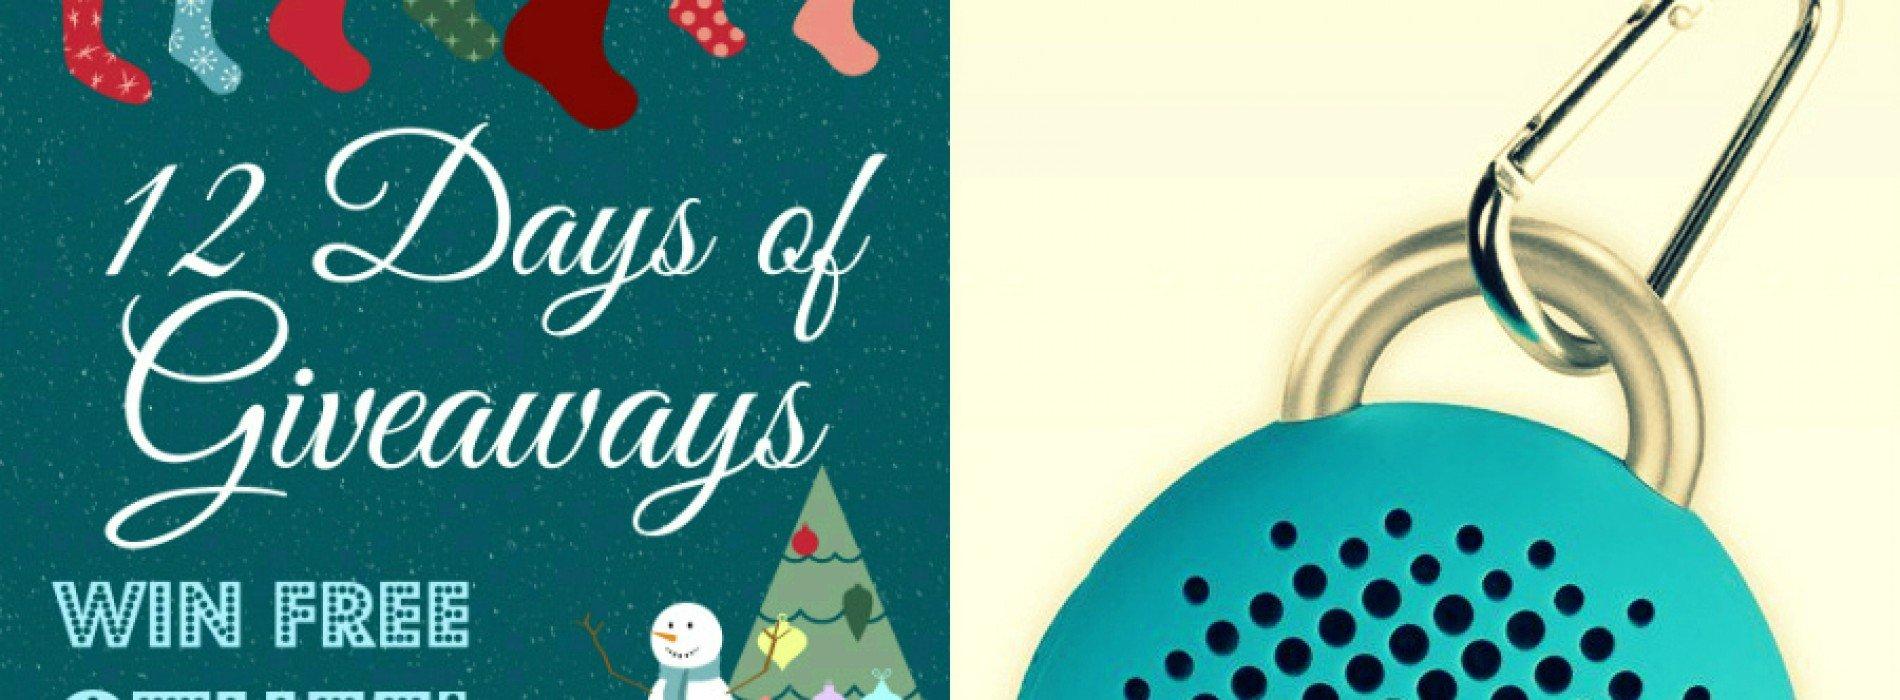 Win a Bluetune-Bean [12 Days of Giveaways] (Update)